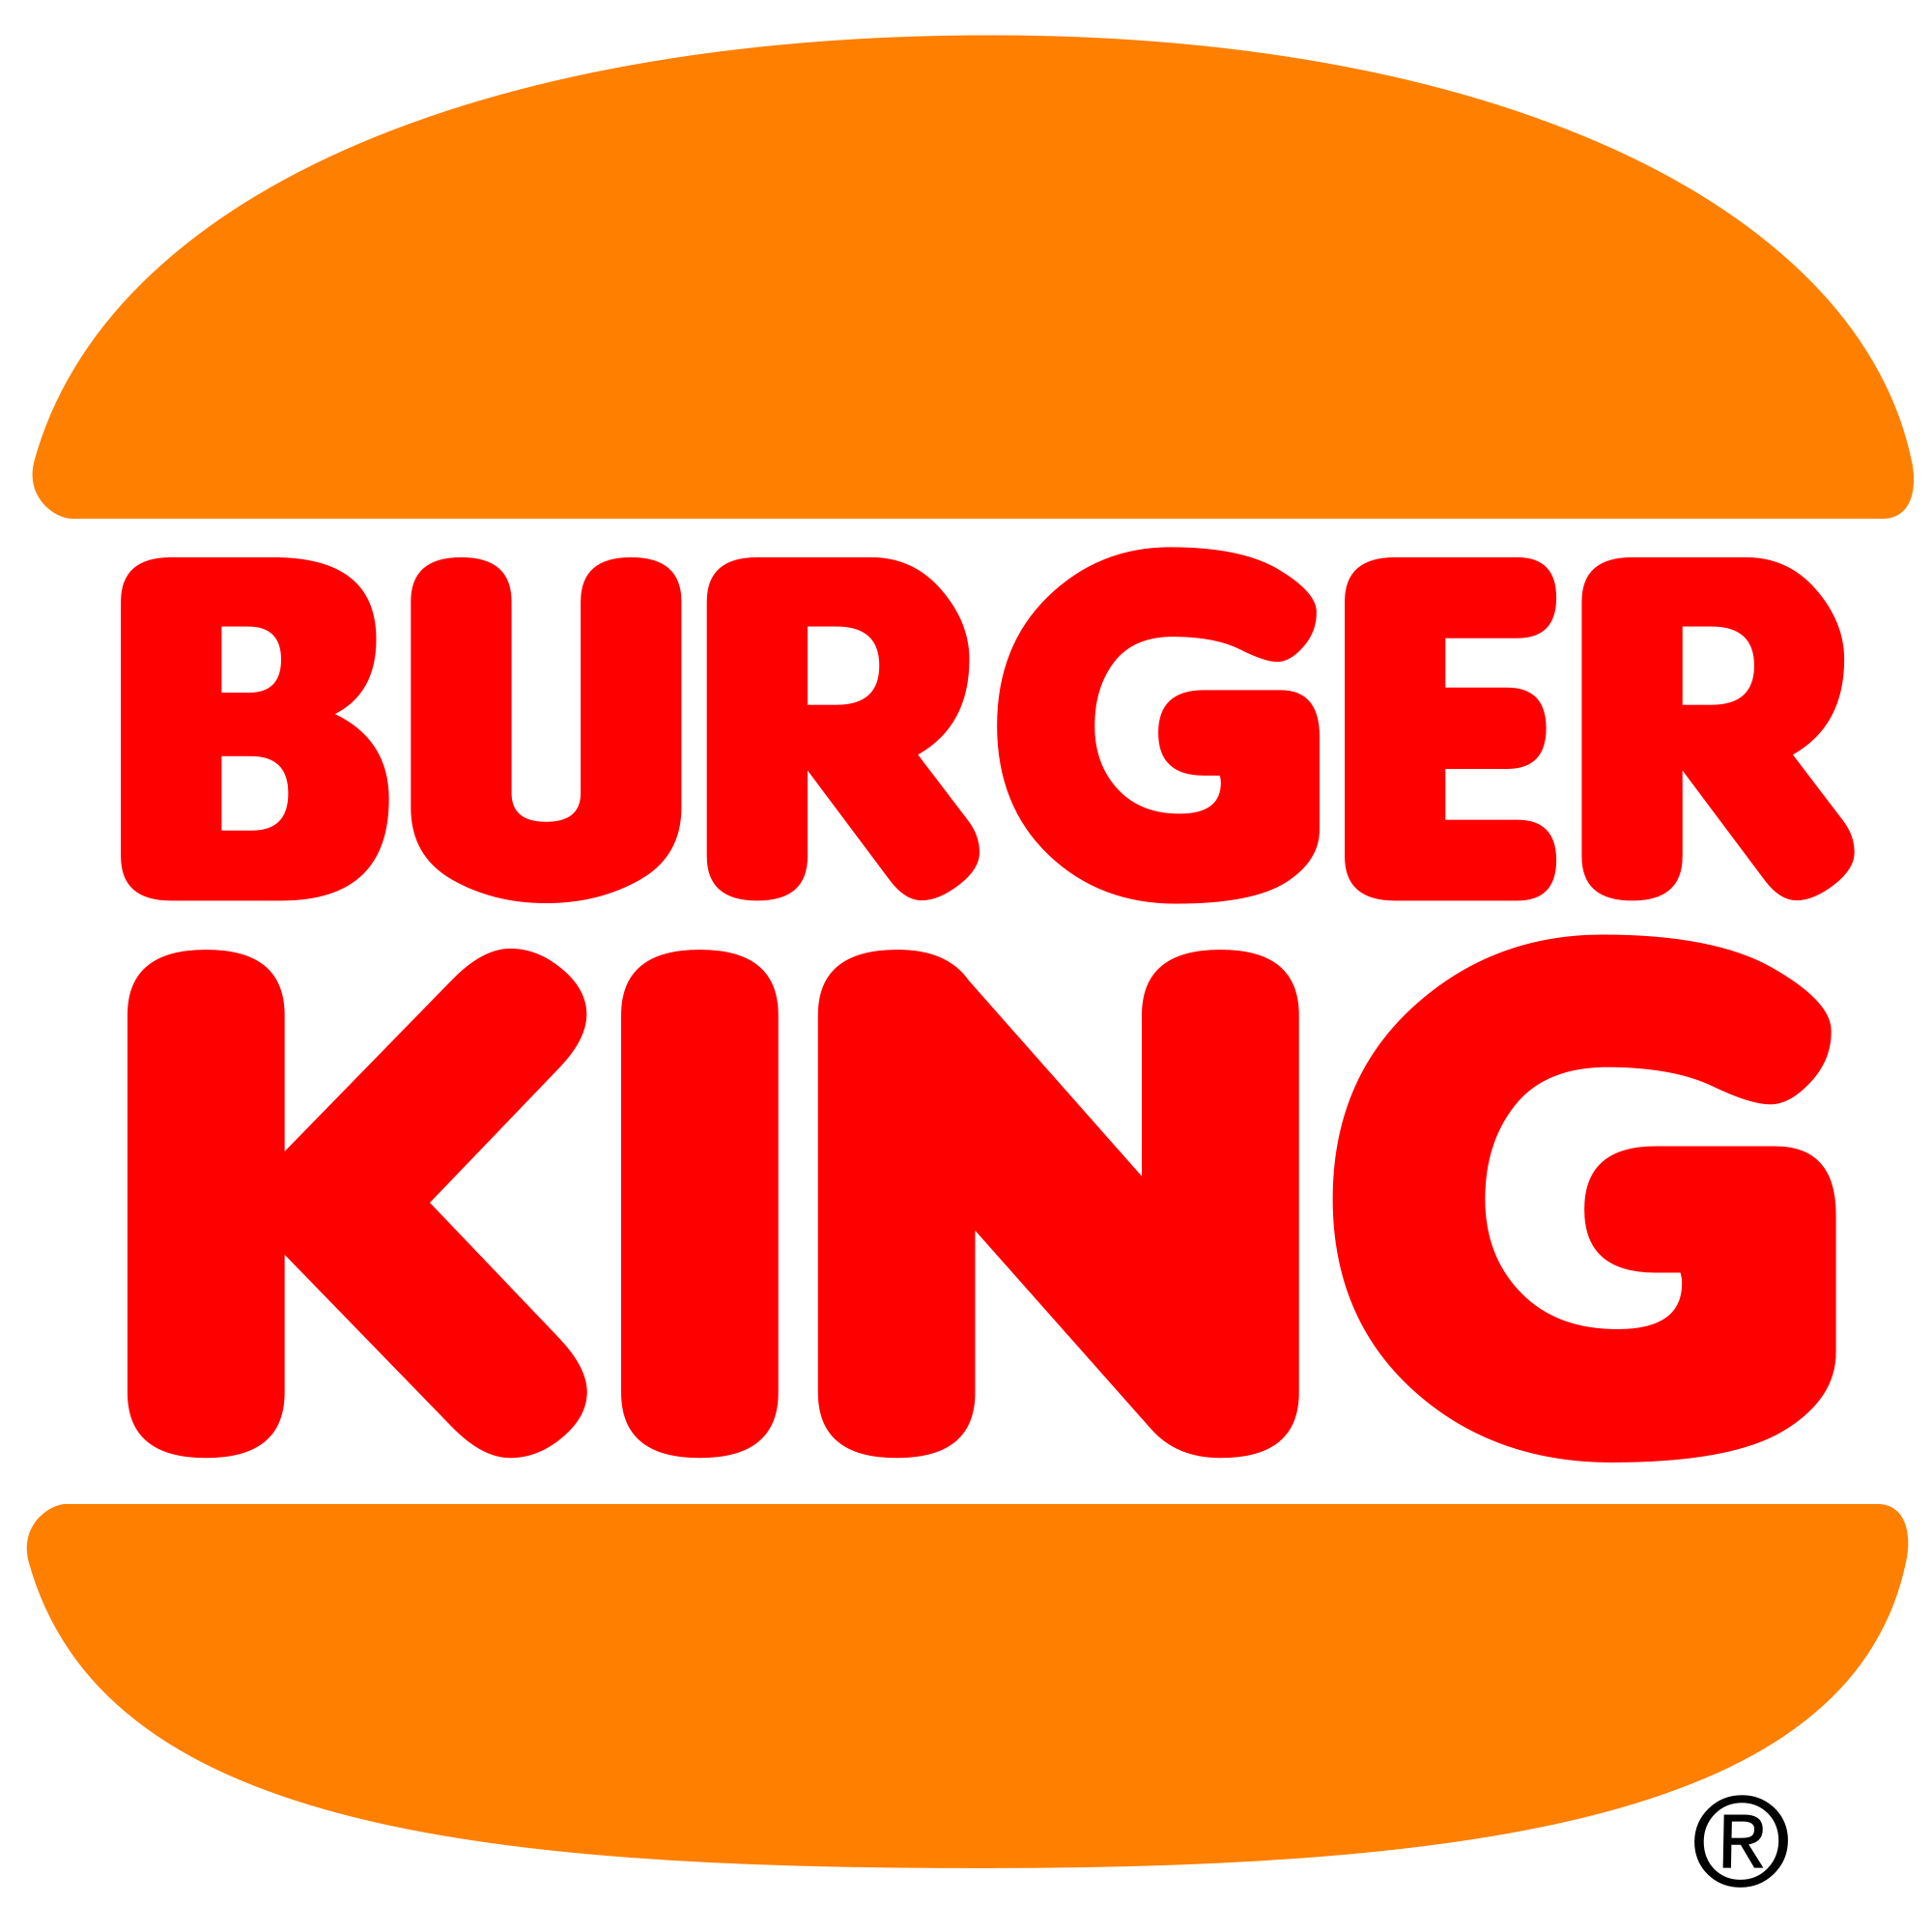 Toronto Burger King Restaurant Construction Projects